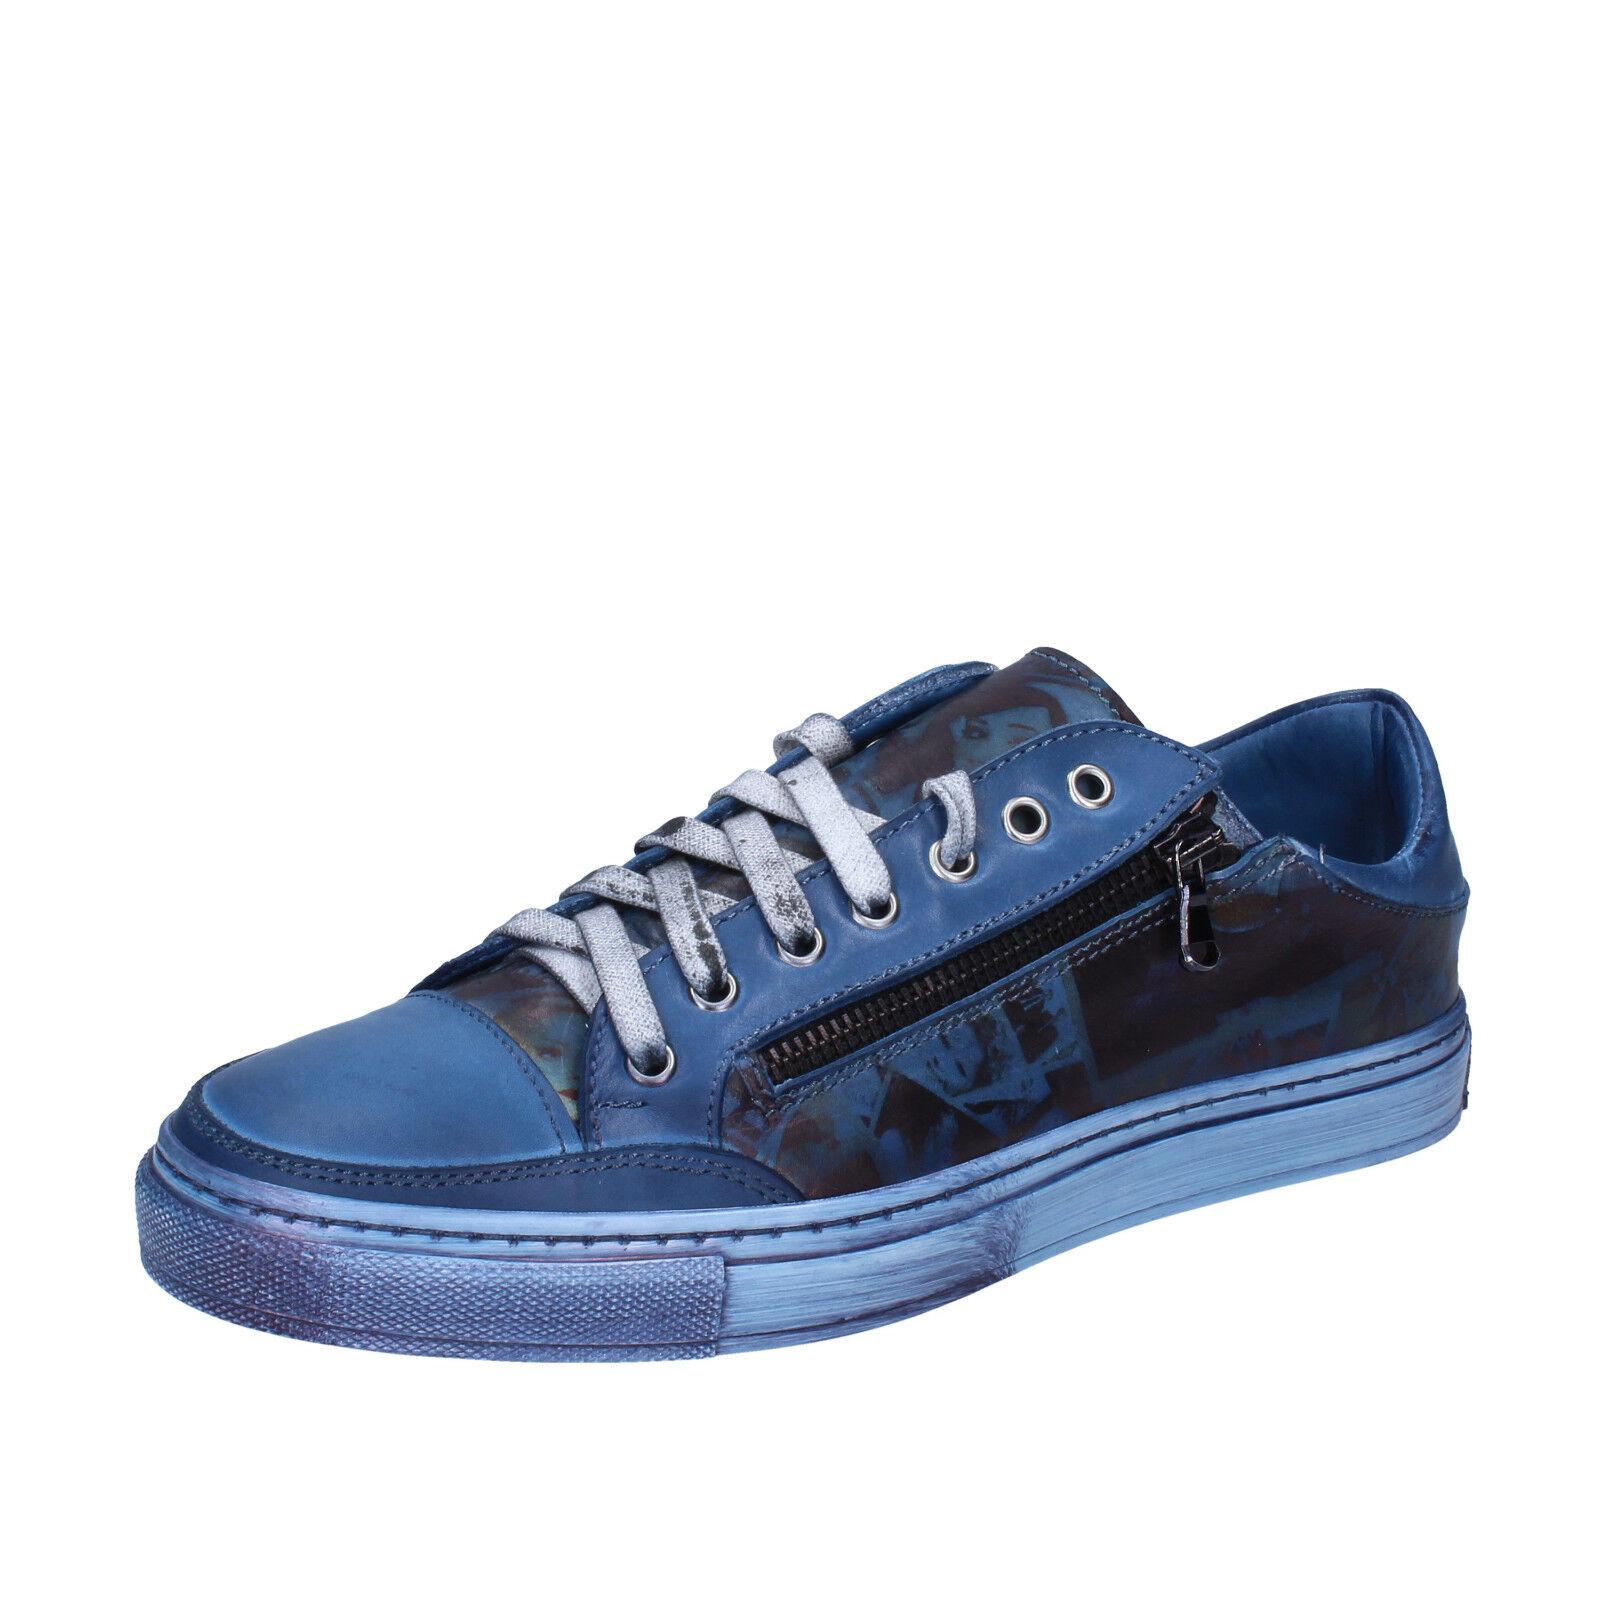 HimalayanSkater Style Blu Scarpe Antinfortunistiche Unisex adulti Blue 37 Blu